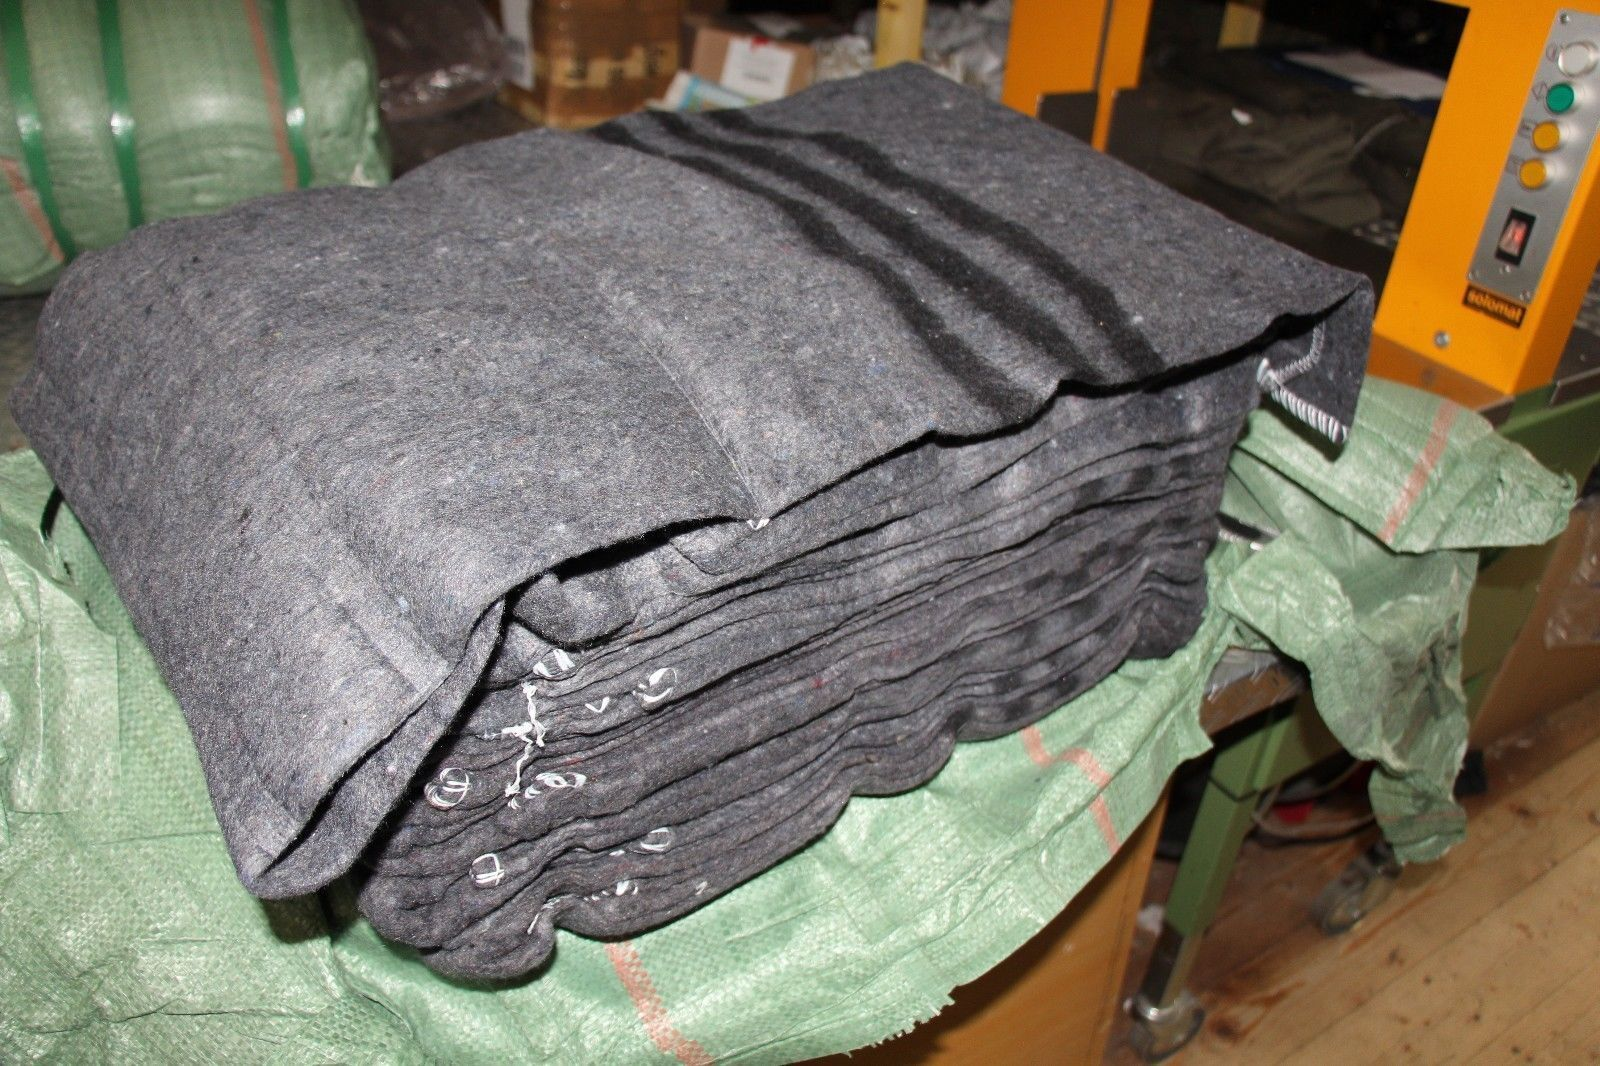 Wolldecke dunkelgrau 200 x 150cm mit Randkettelung Decke Pferdedecke NEU!